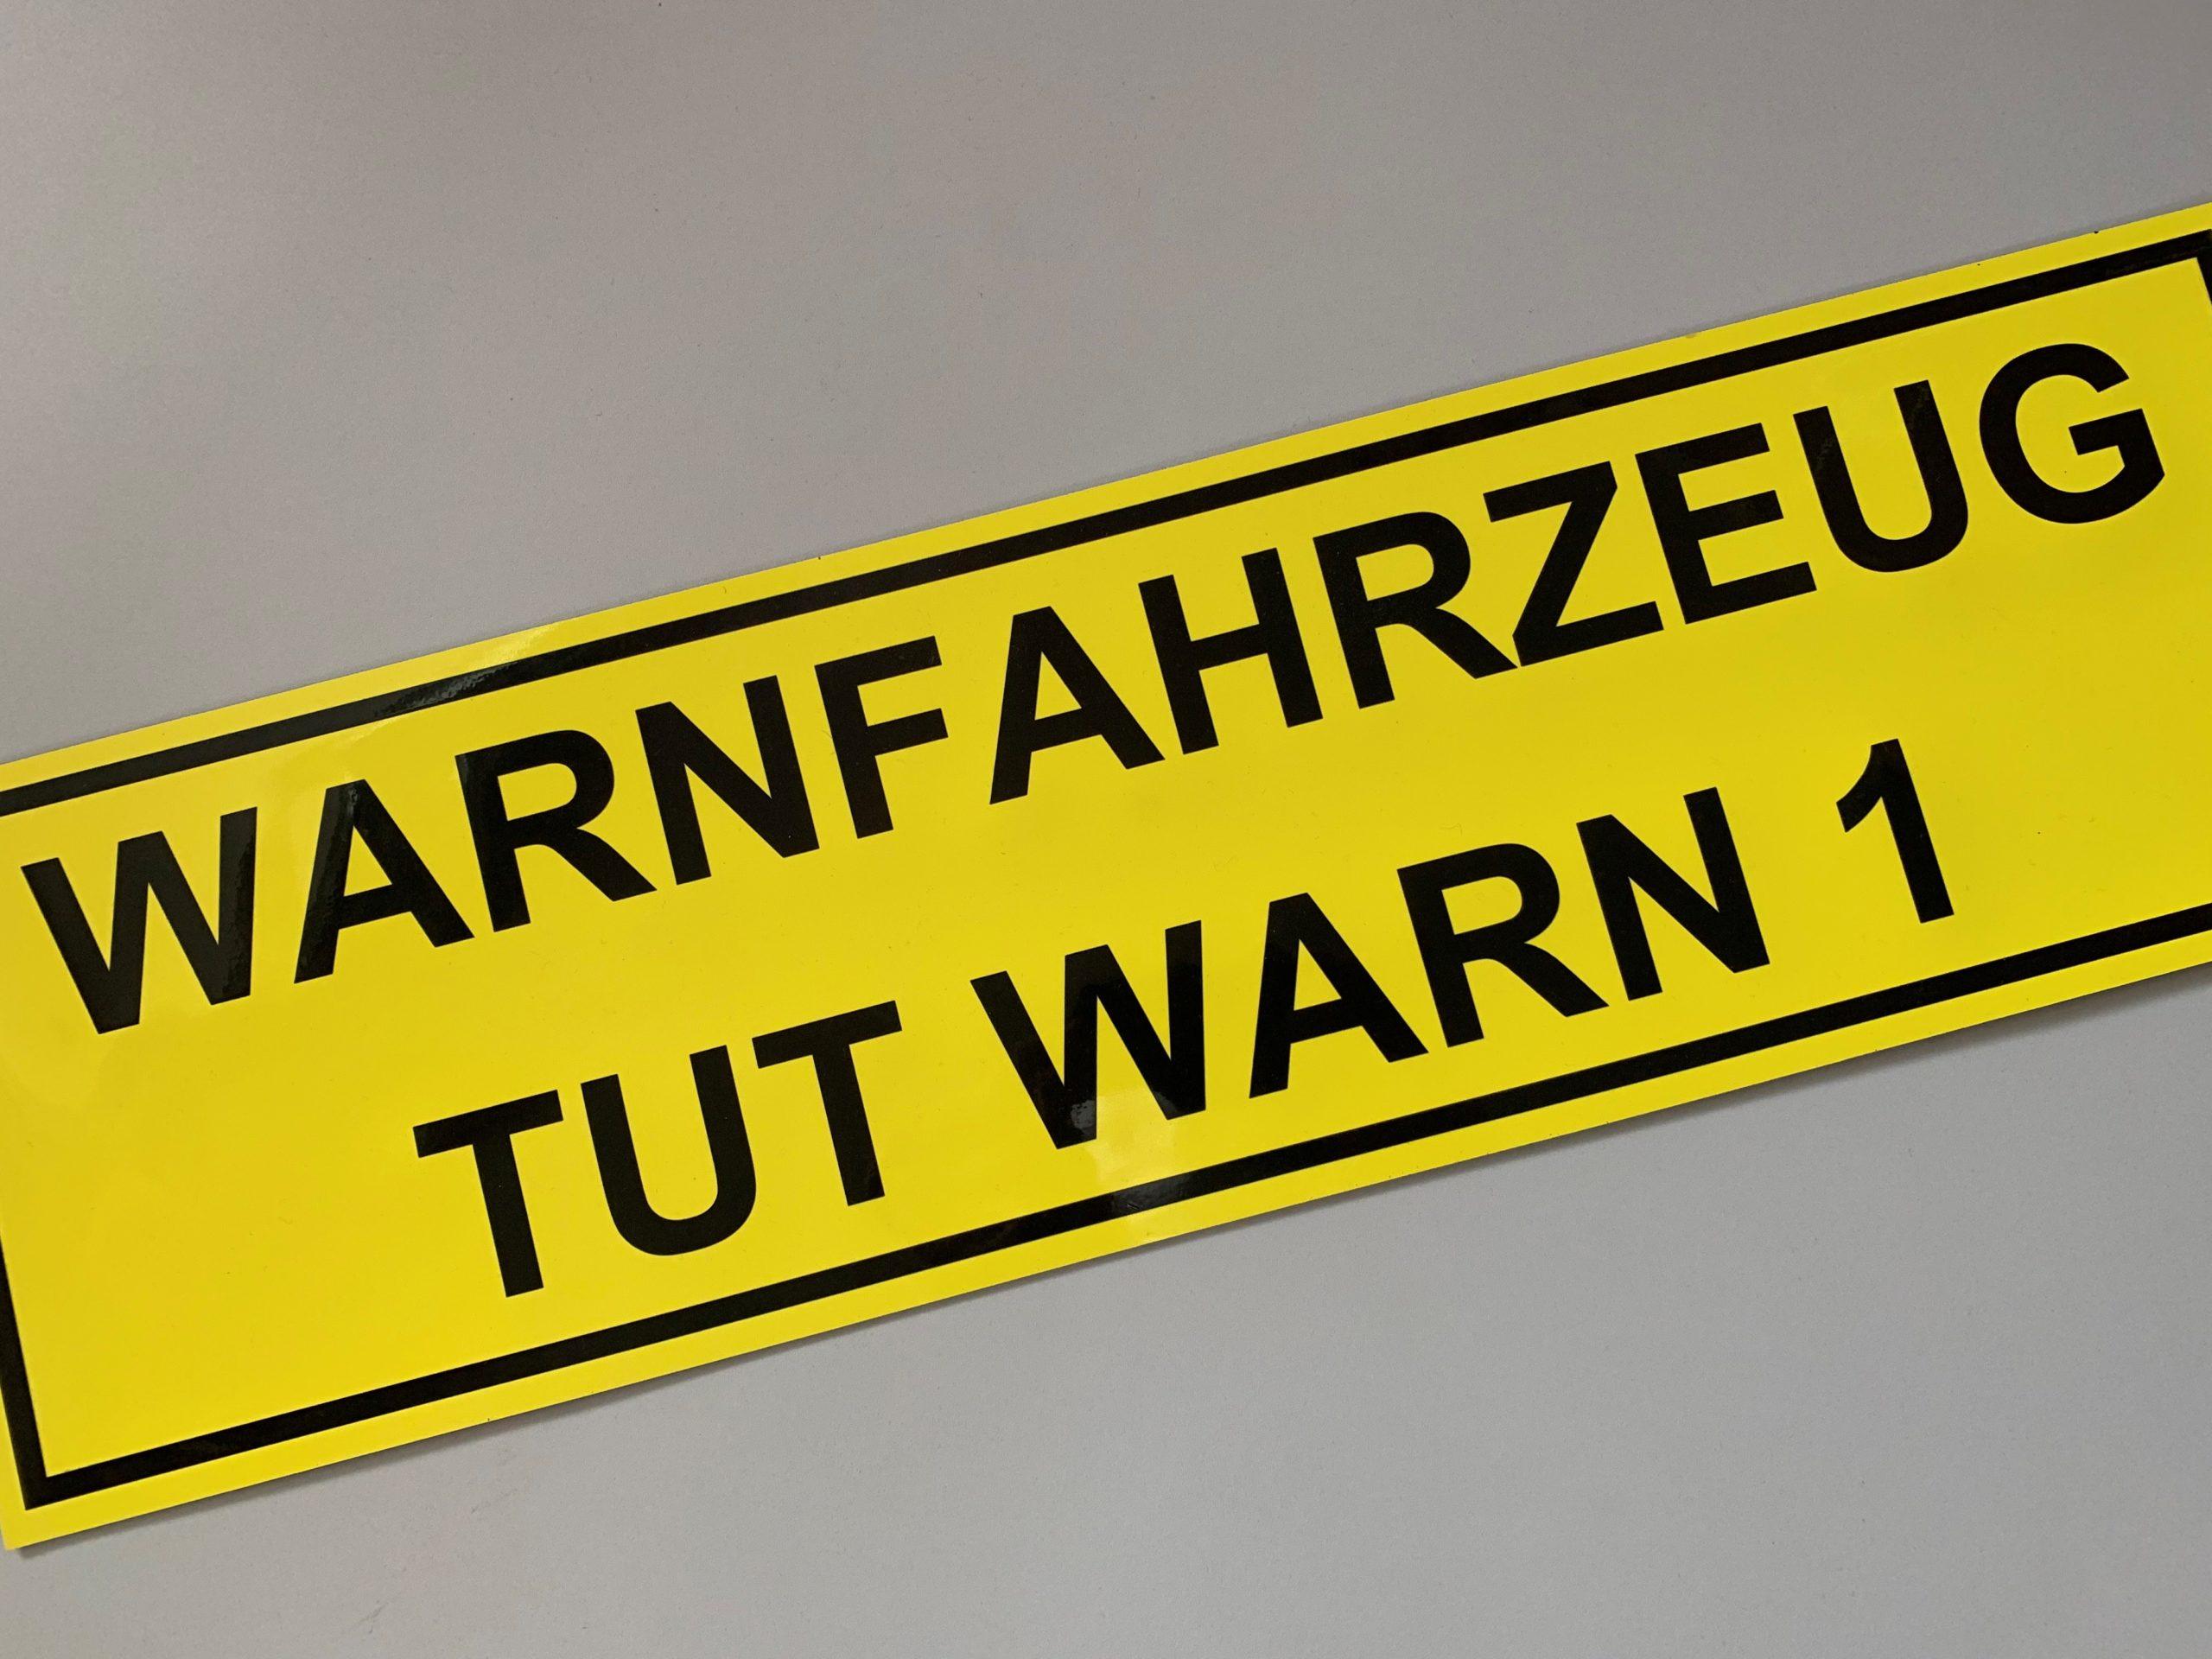 Bundesweiter Warntag am 10. September informiert zur Bevölkerungswarnung